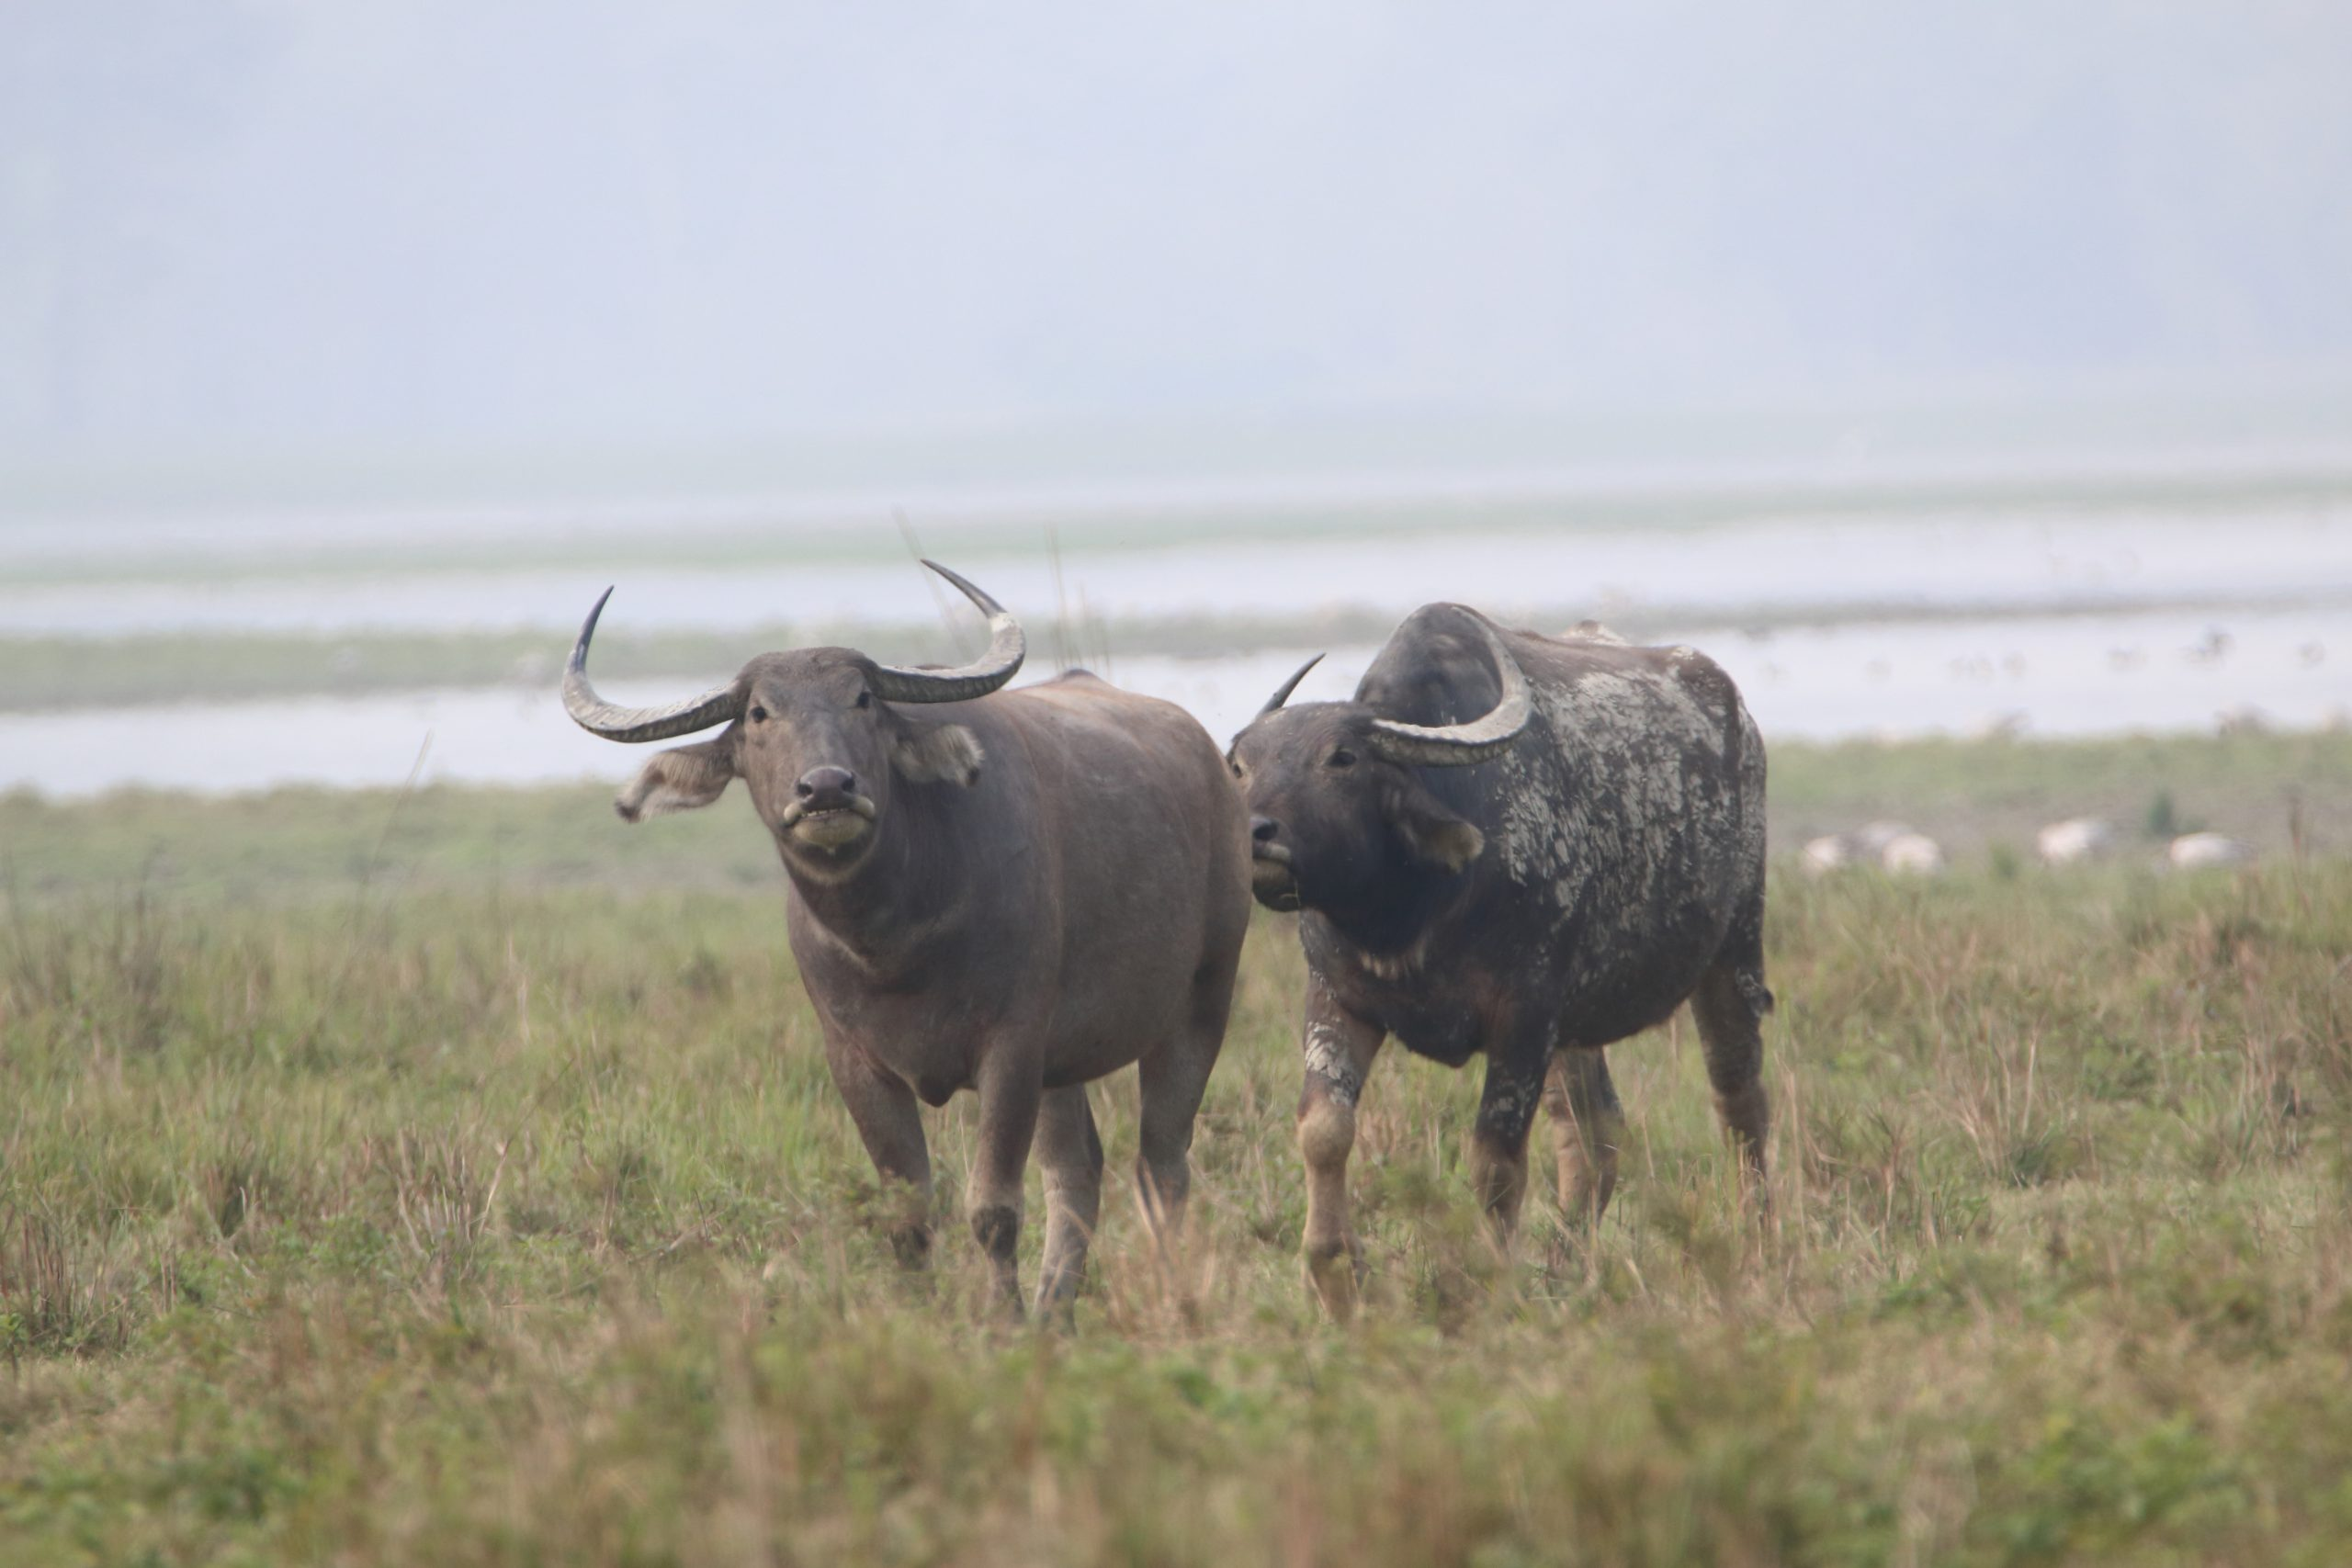 Wild buffalo on the grass